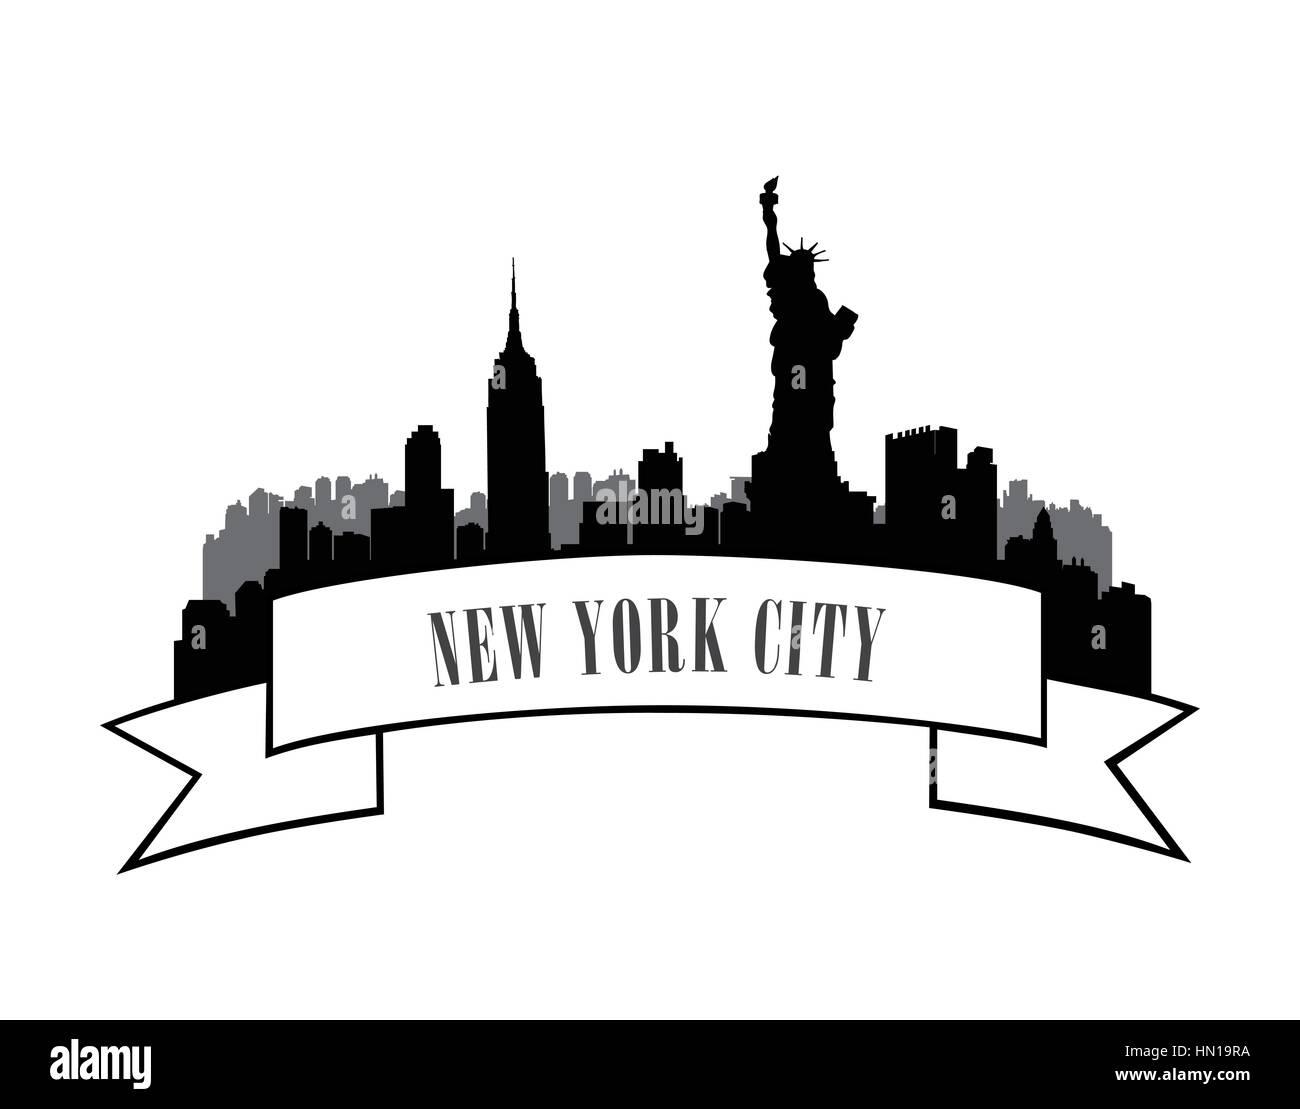 New York, USA skyline sketch. NYC city silhouette with Liberty monument. City silhouette Skyline. Panorama city - Stock Image